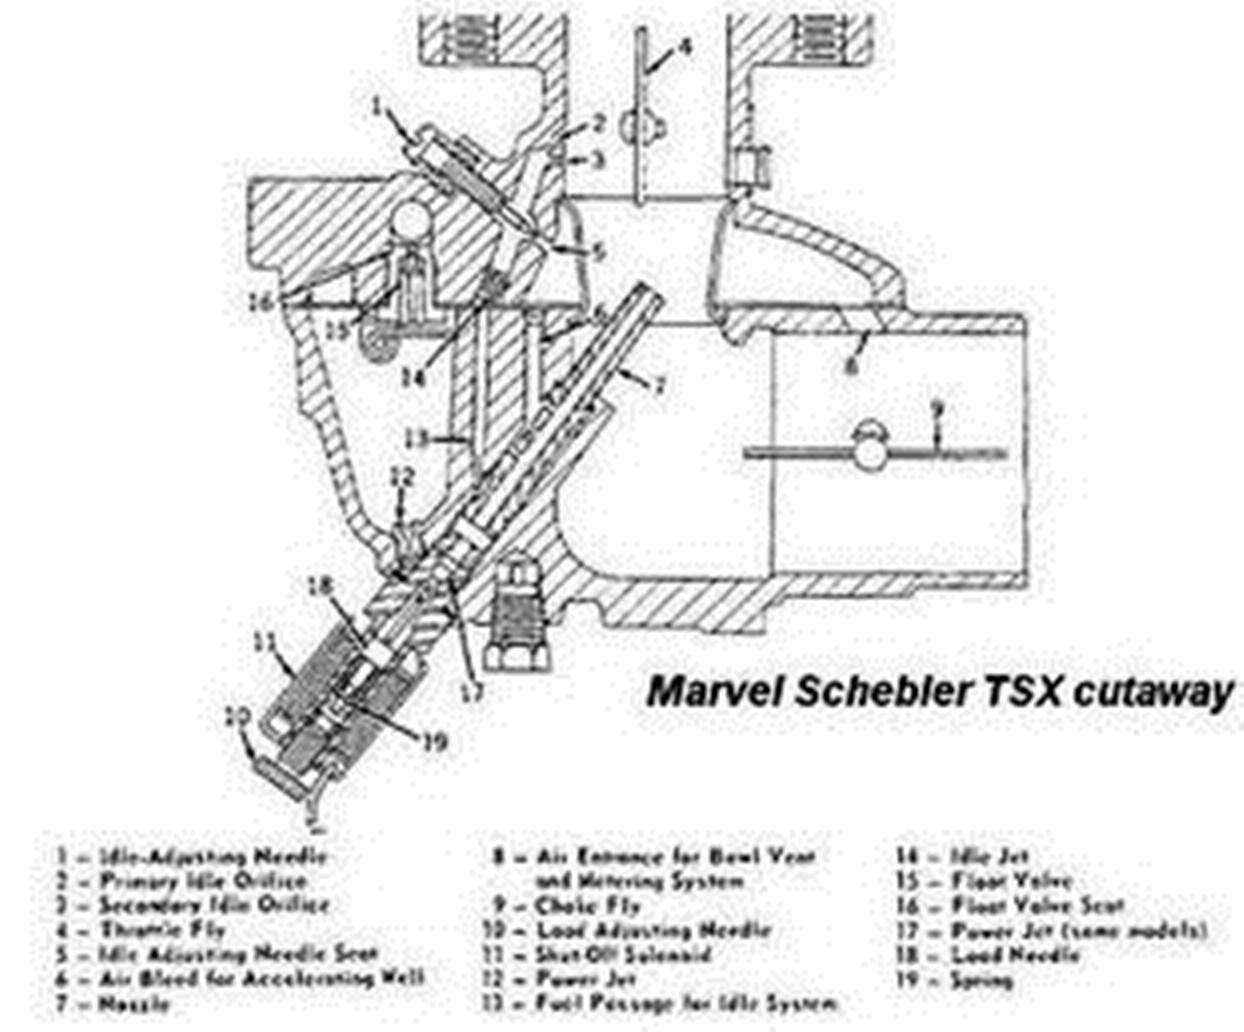 2007 acura tsx engine diagram carburetor fuel level and float setting - page 2 ... 09 tsx engine diagram